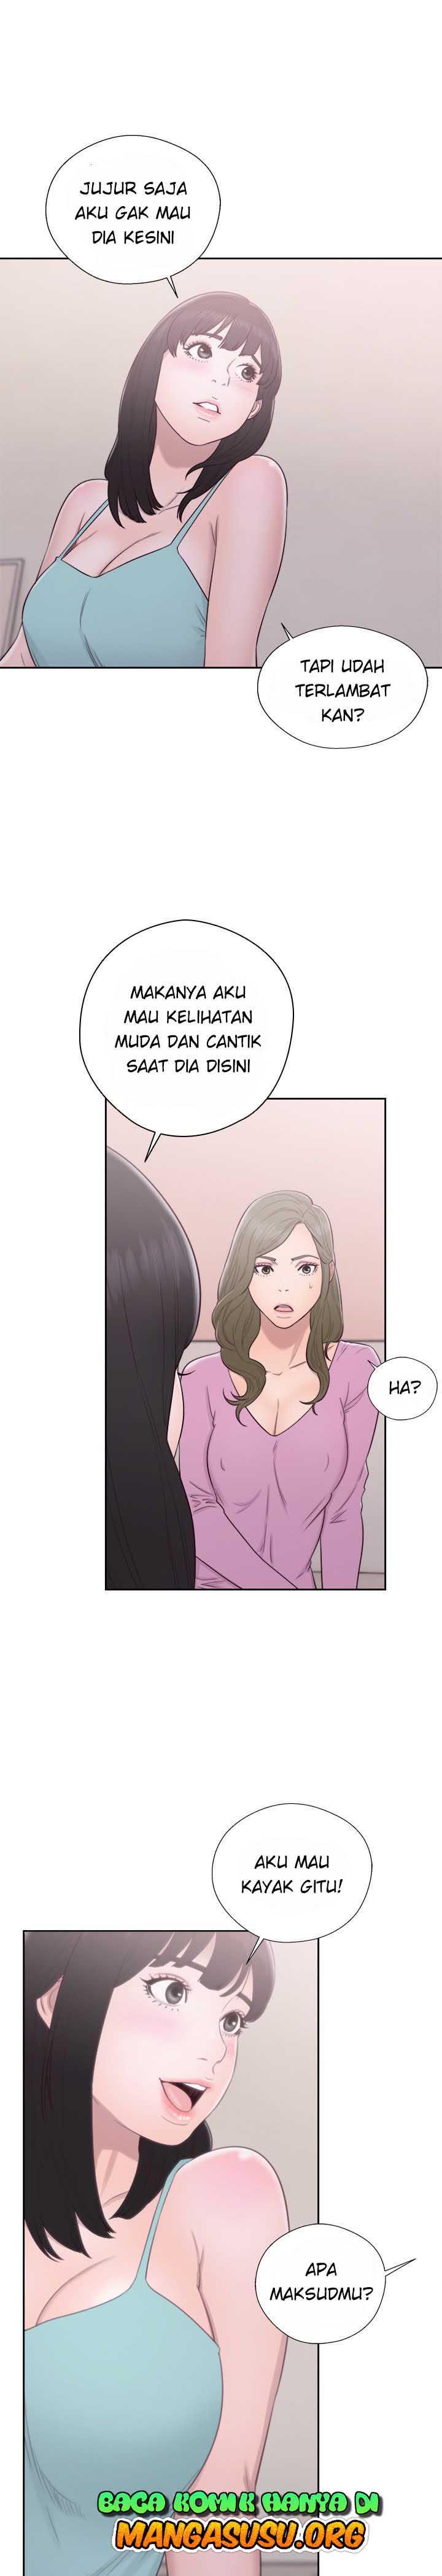 Lust Awakening Chapter 51 Bahasa Indonesia